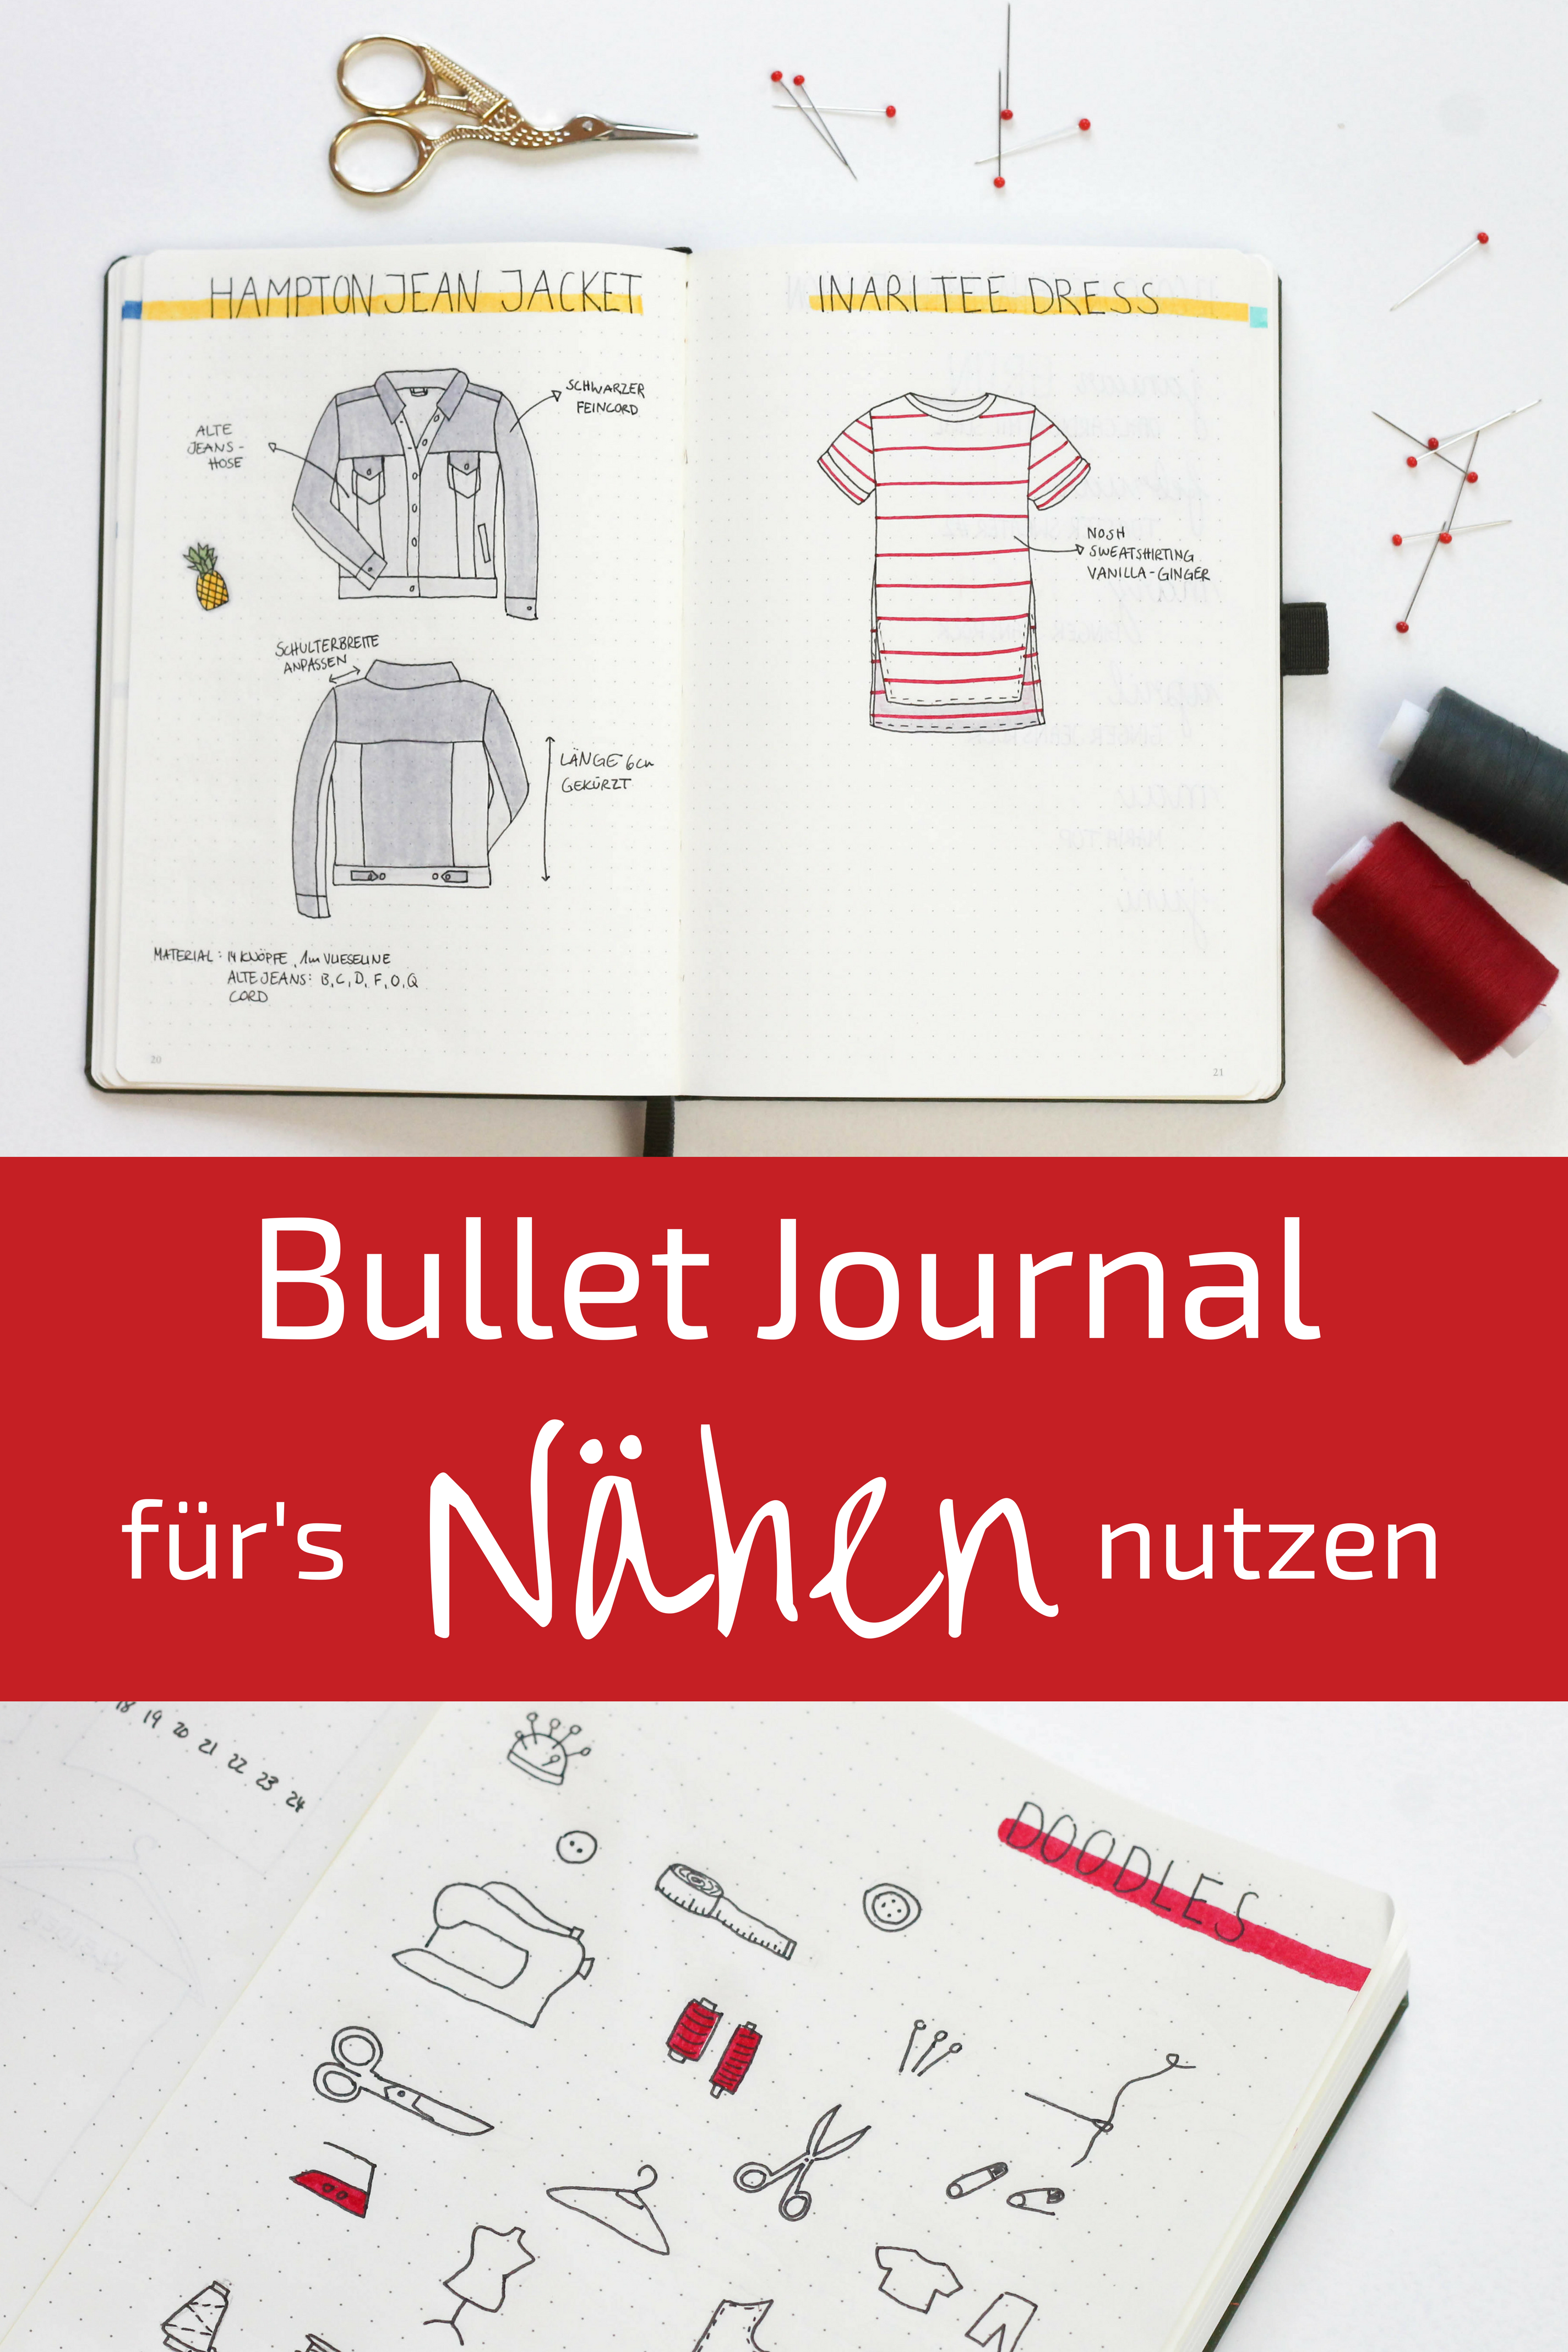 Bullet Journal als Nähplaner nutzen | Pinterest | Nähen, Nähtipps ...